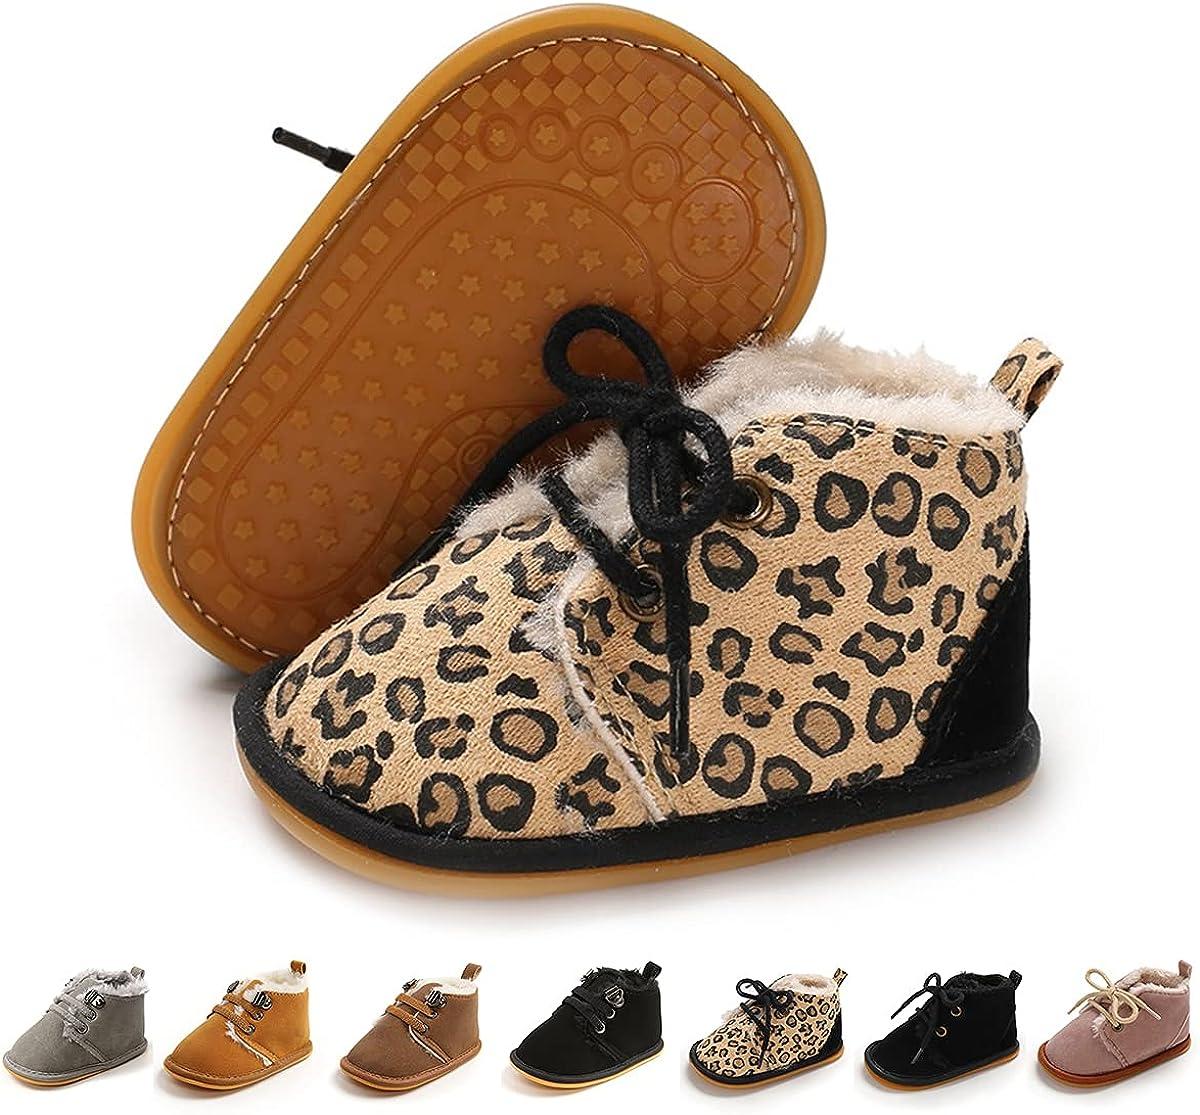 TAREYKA Baby Free shipping on posting reviews Booties Infant Girls Winter San Jose Mall Newborn Shoes Boys